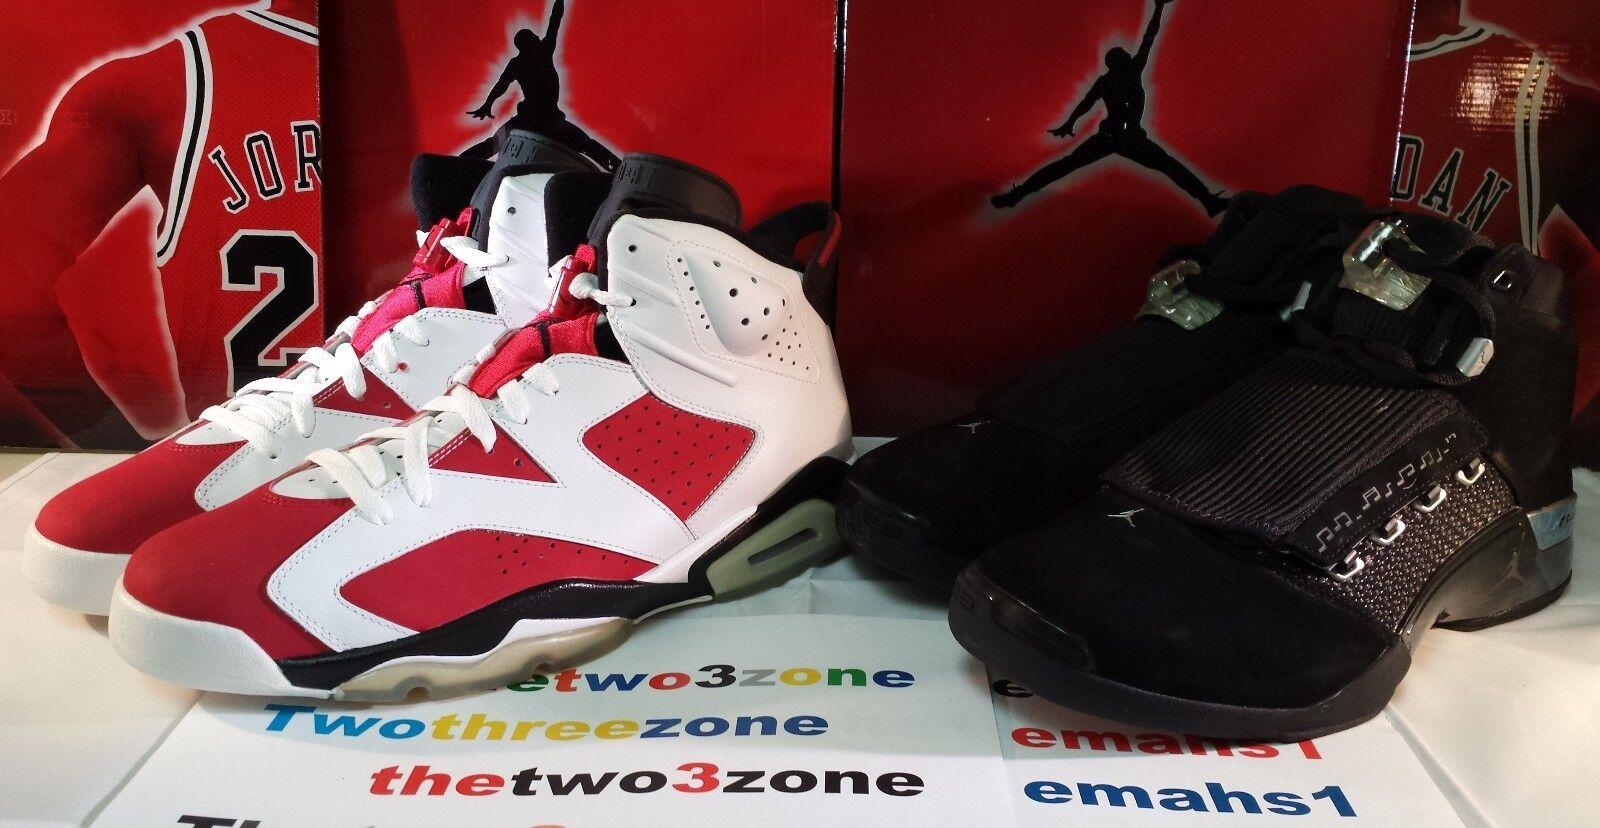 Nike Air Jordan Retro 17 6 CDP sz 12 XVII VI dmp carmine doernbecher iv xi iii